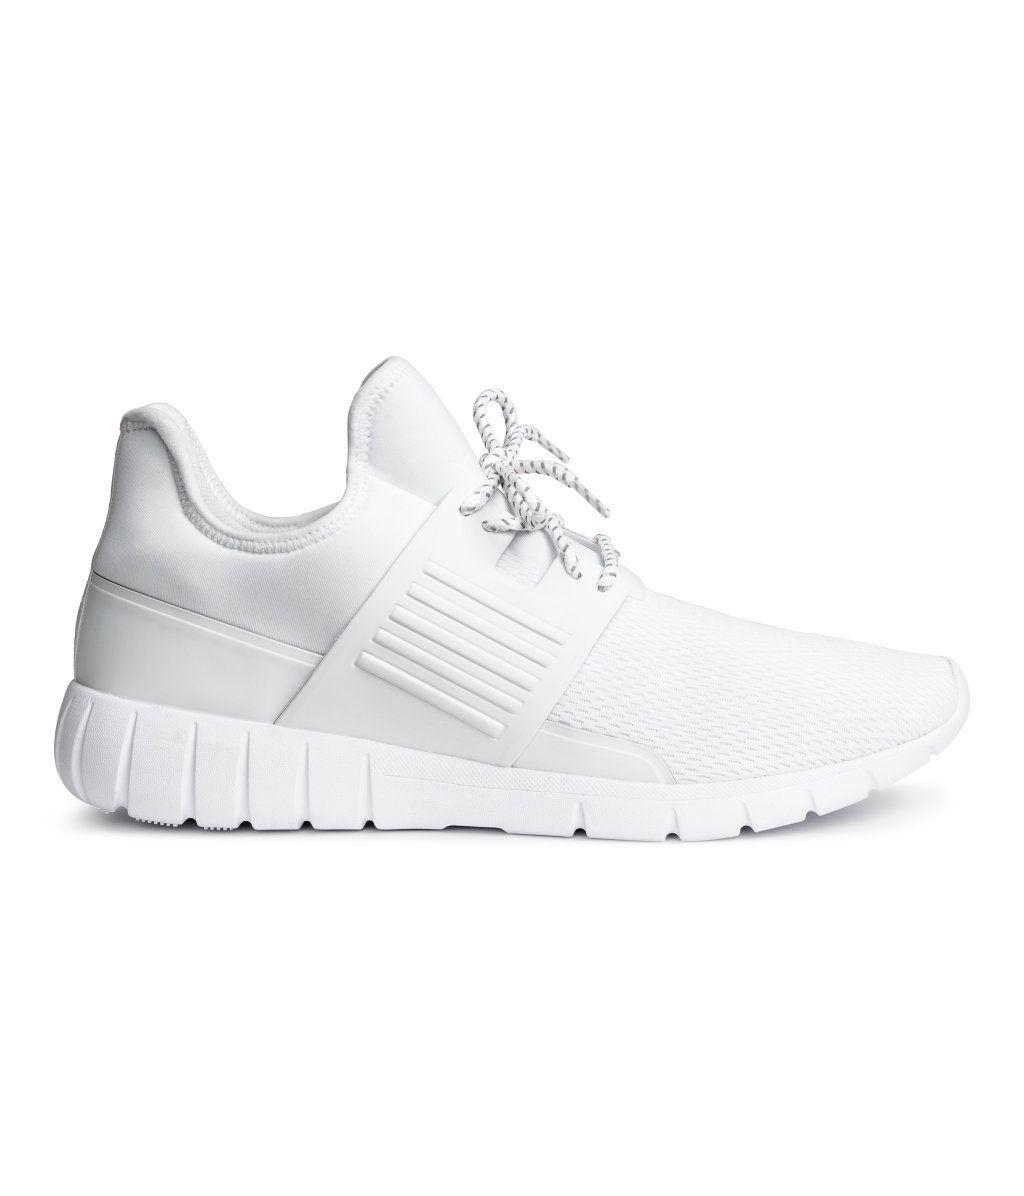 Sneaker aus Mesh | Weiß | Herren | H&M DE | Wish List